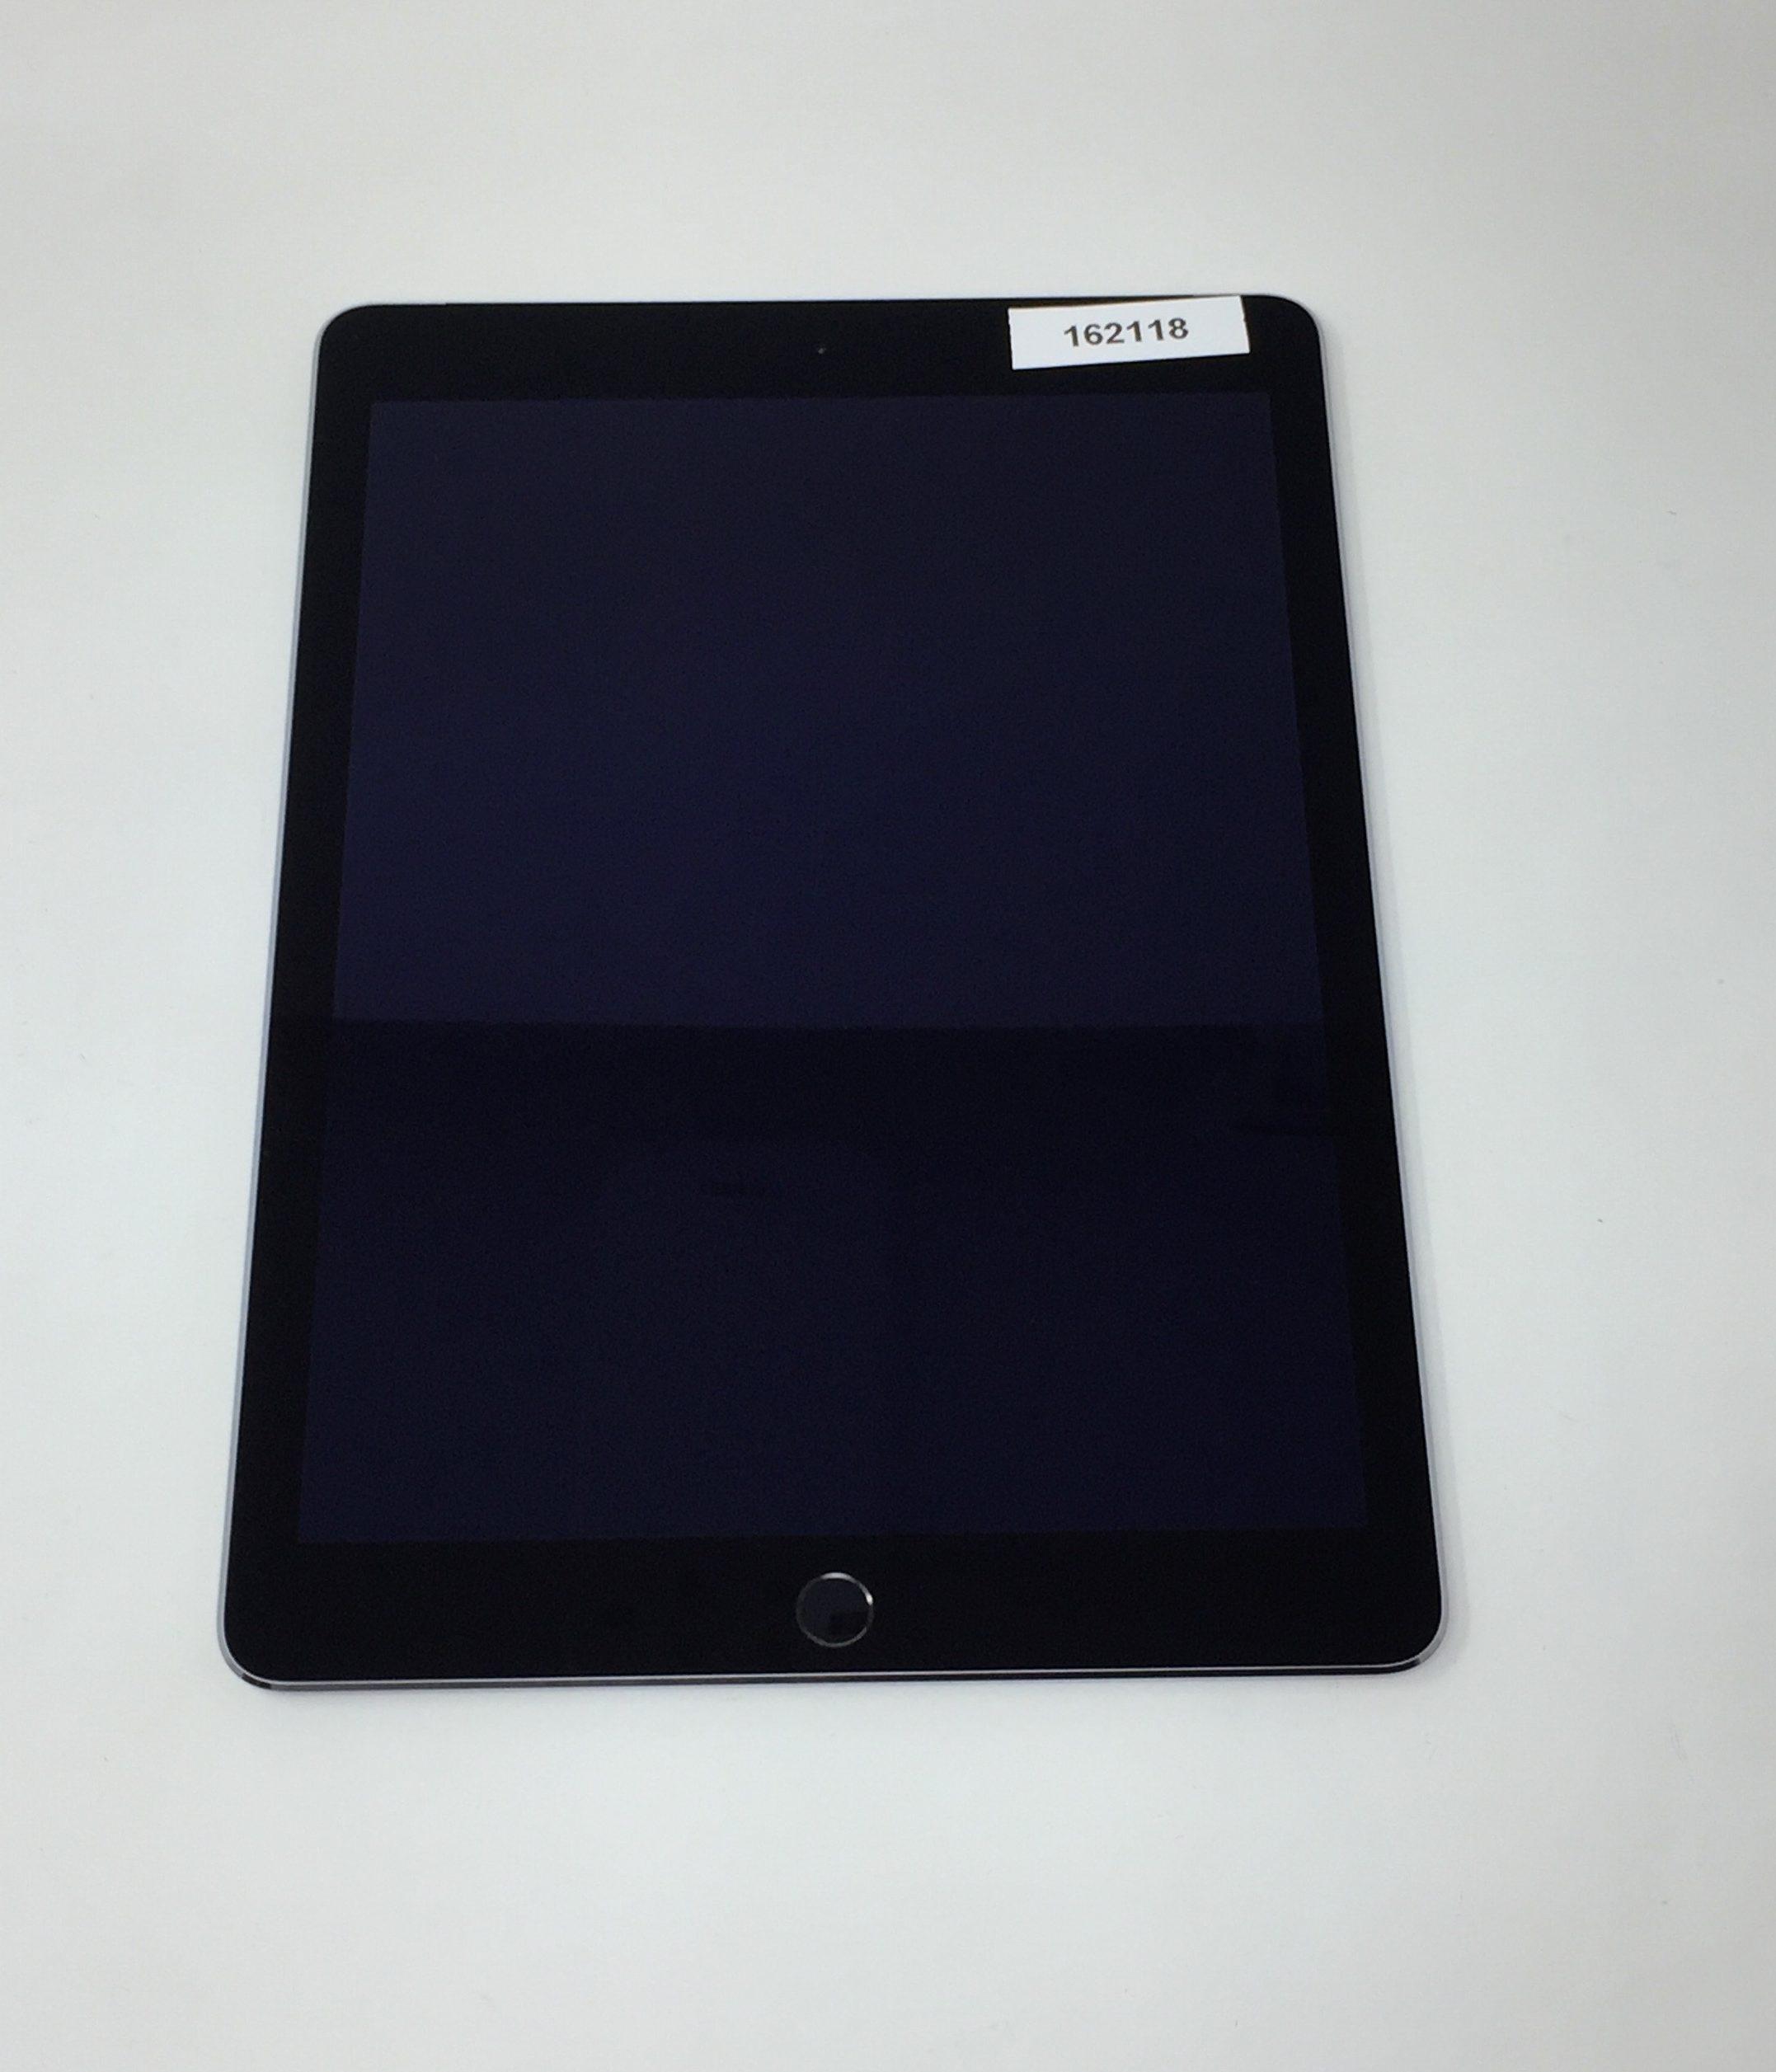 iPad Air Wi-Fi + Cellular 128GB, 64 GB, Gray, imagen 1